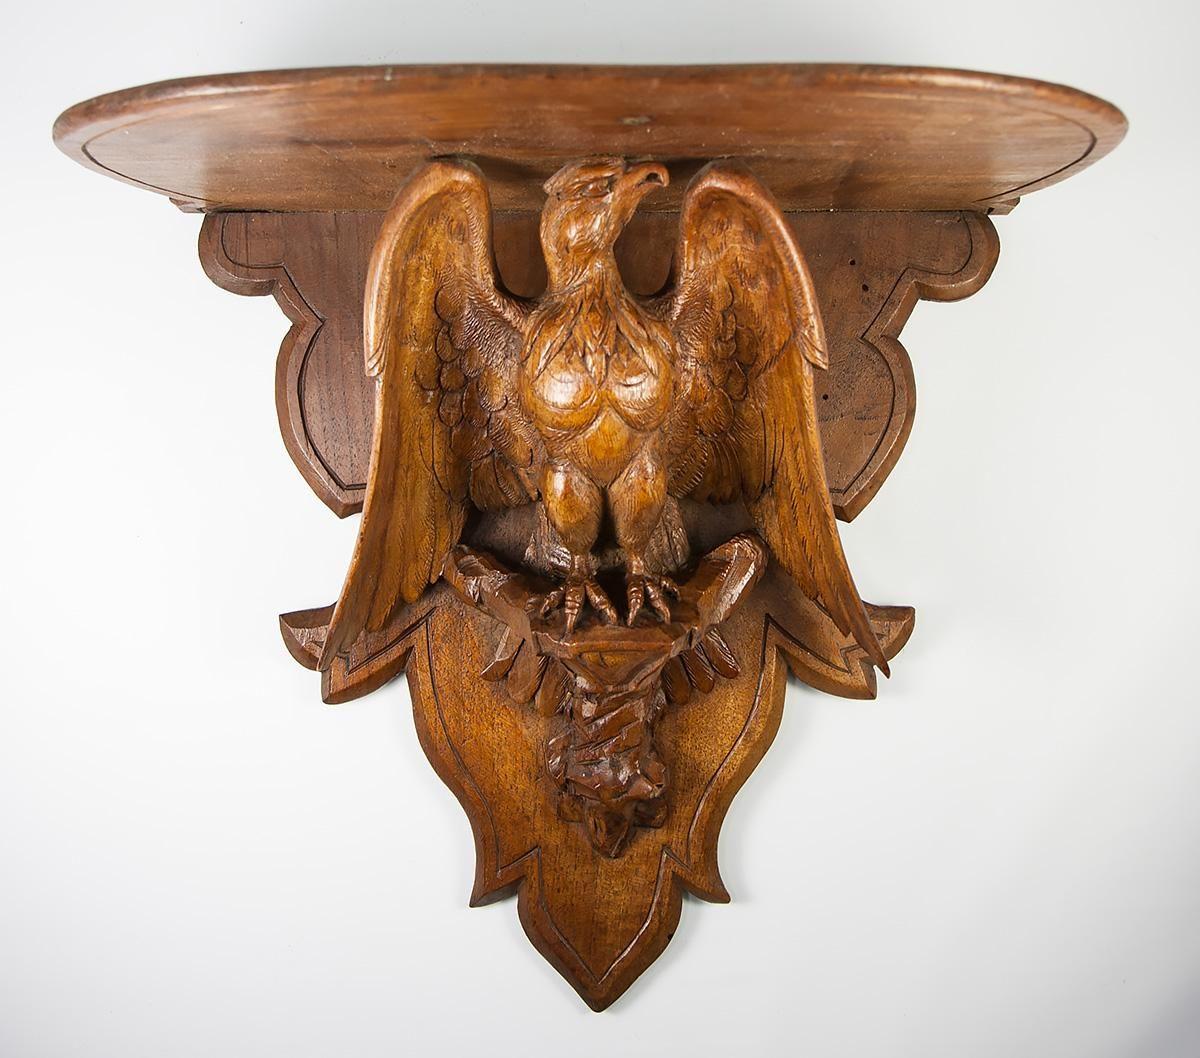 "Antique Black Forest PAIR of Large 13"" Wall Shelf, Bracket or Clock Shelves, Eagles"